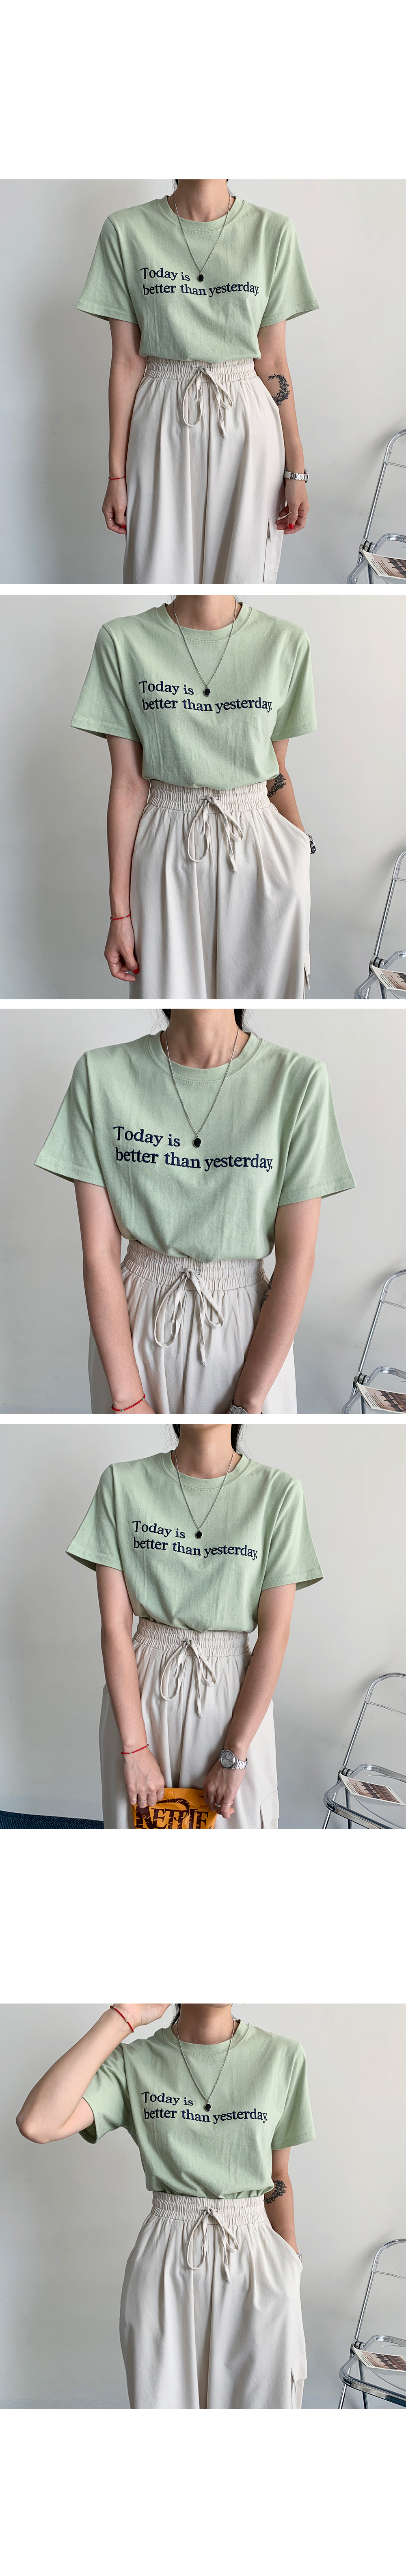 Barerdanja Short Sleeve Tee